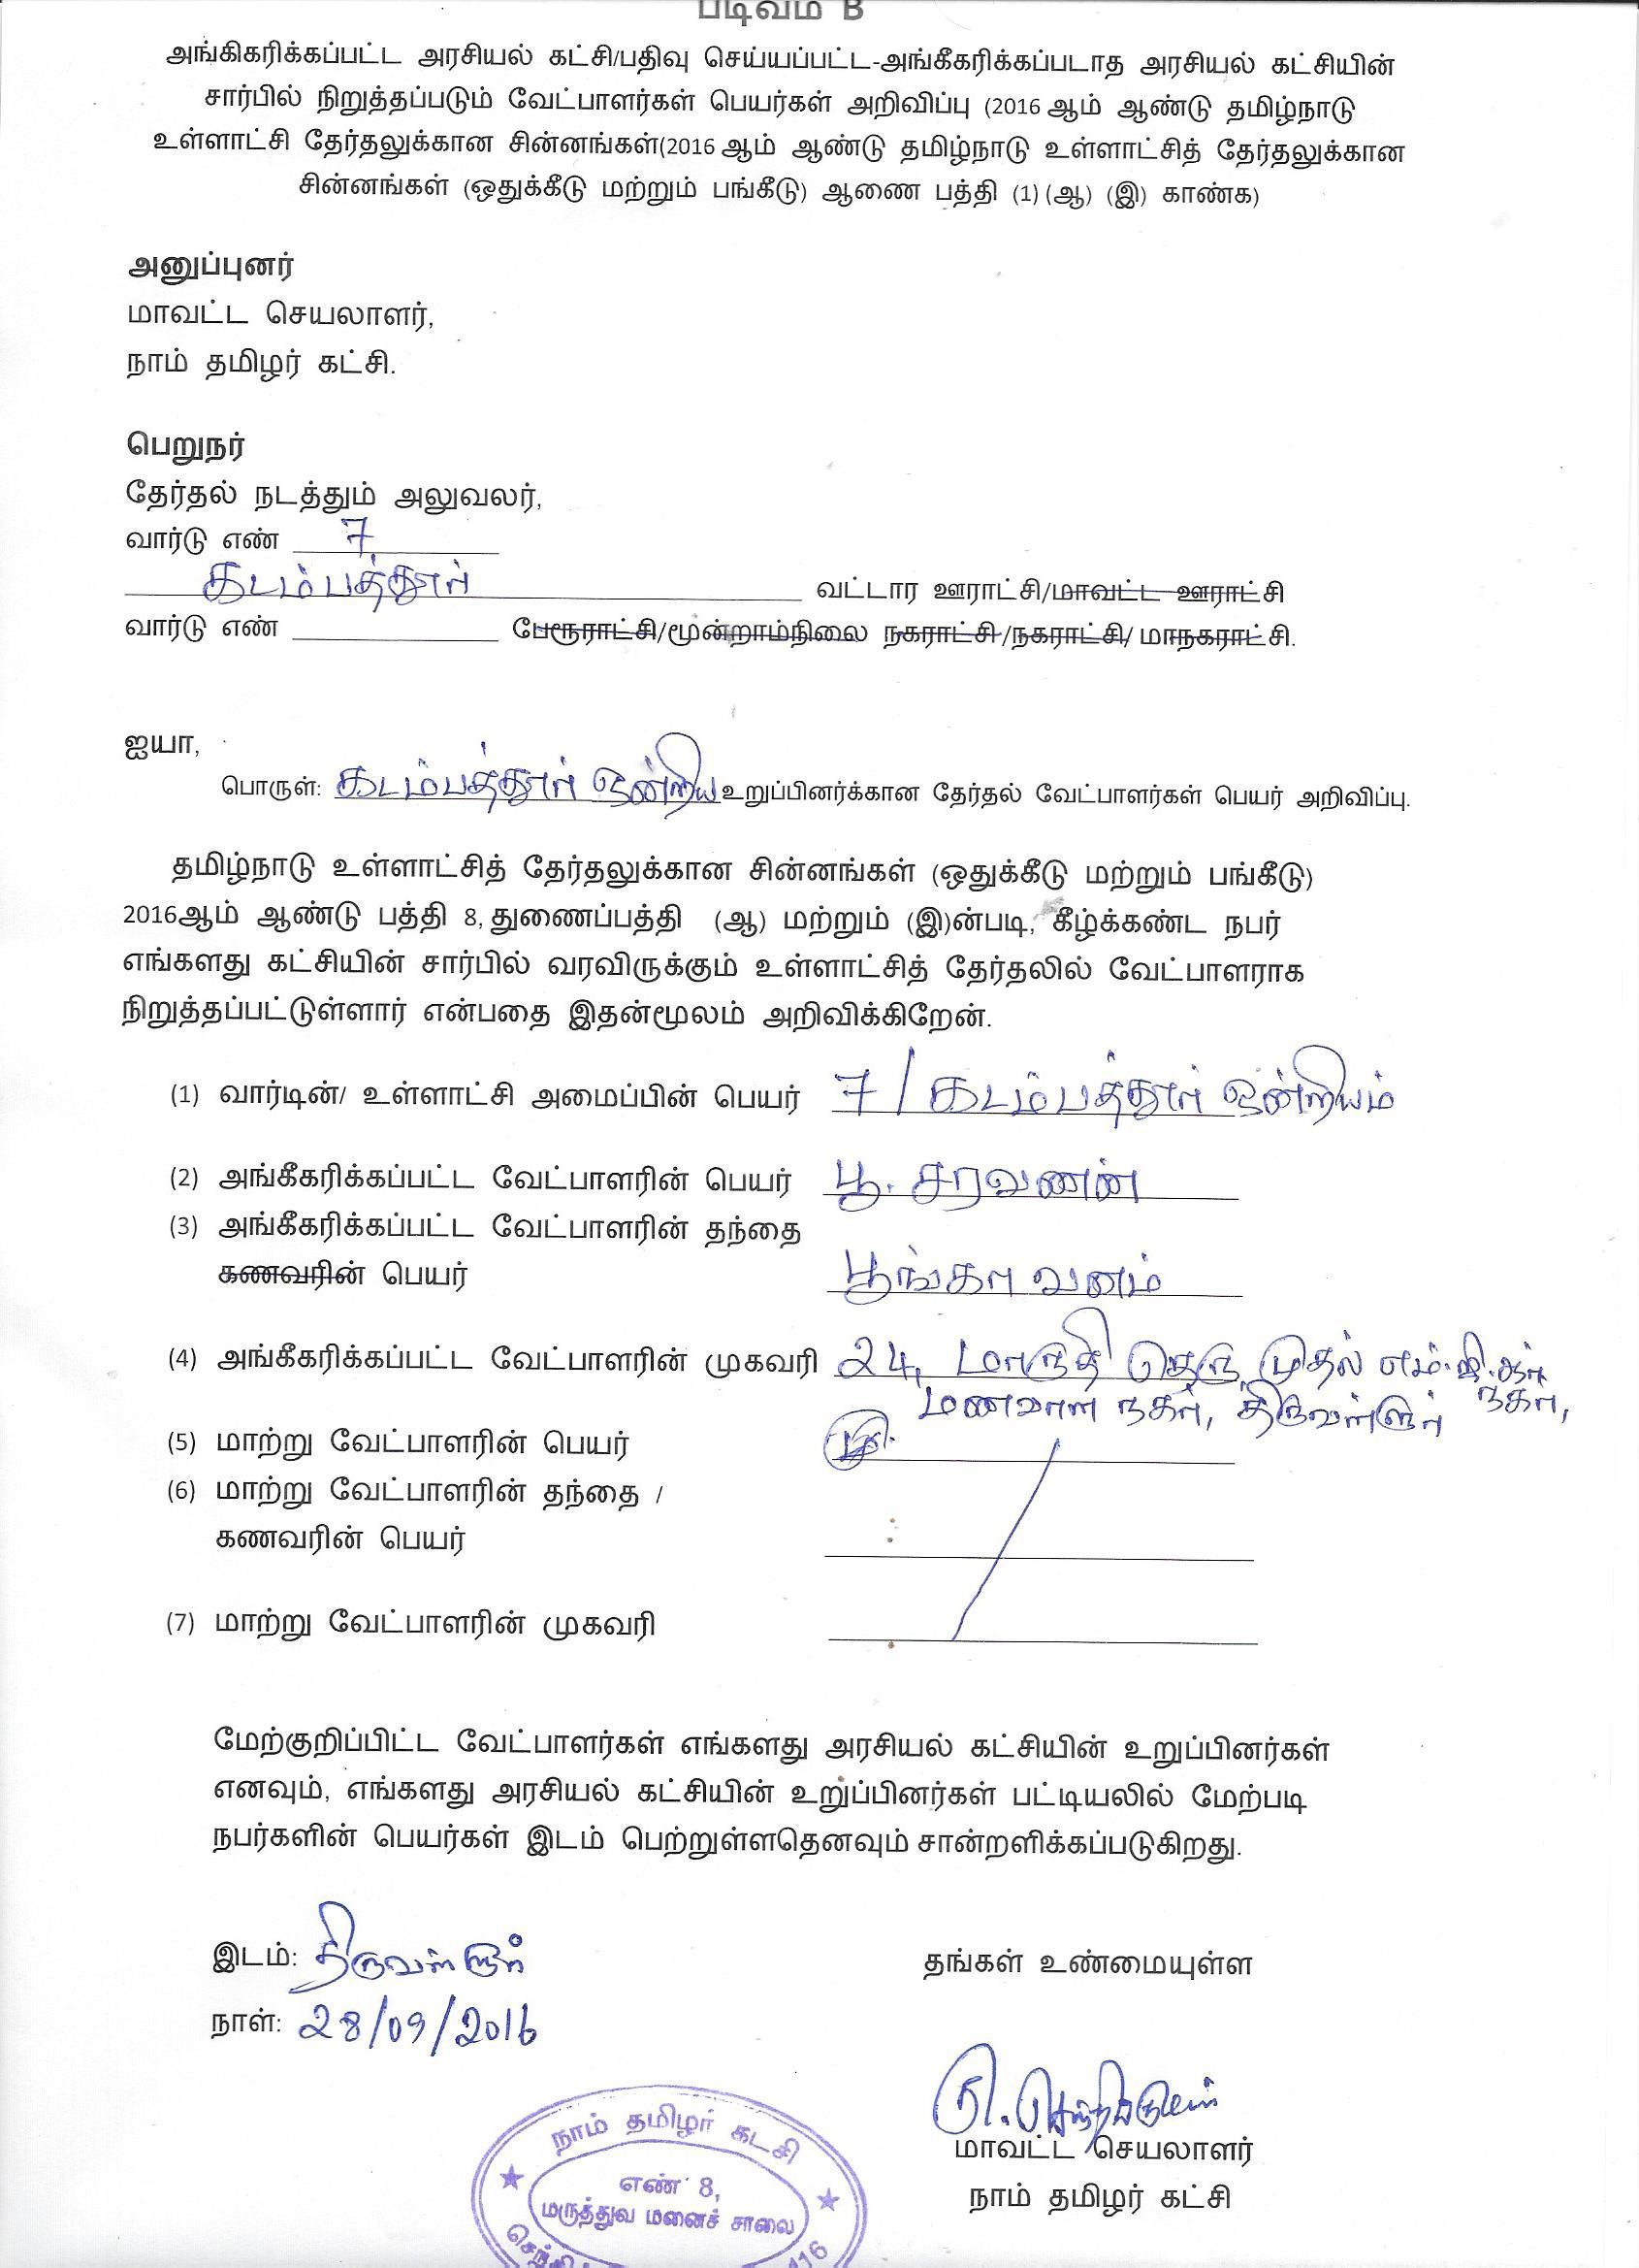 Naam-Tamilar-Civic-Election-Form-B